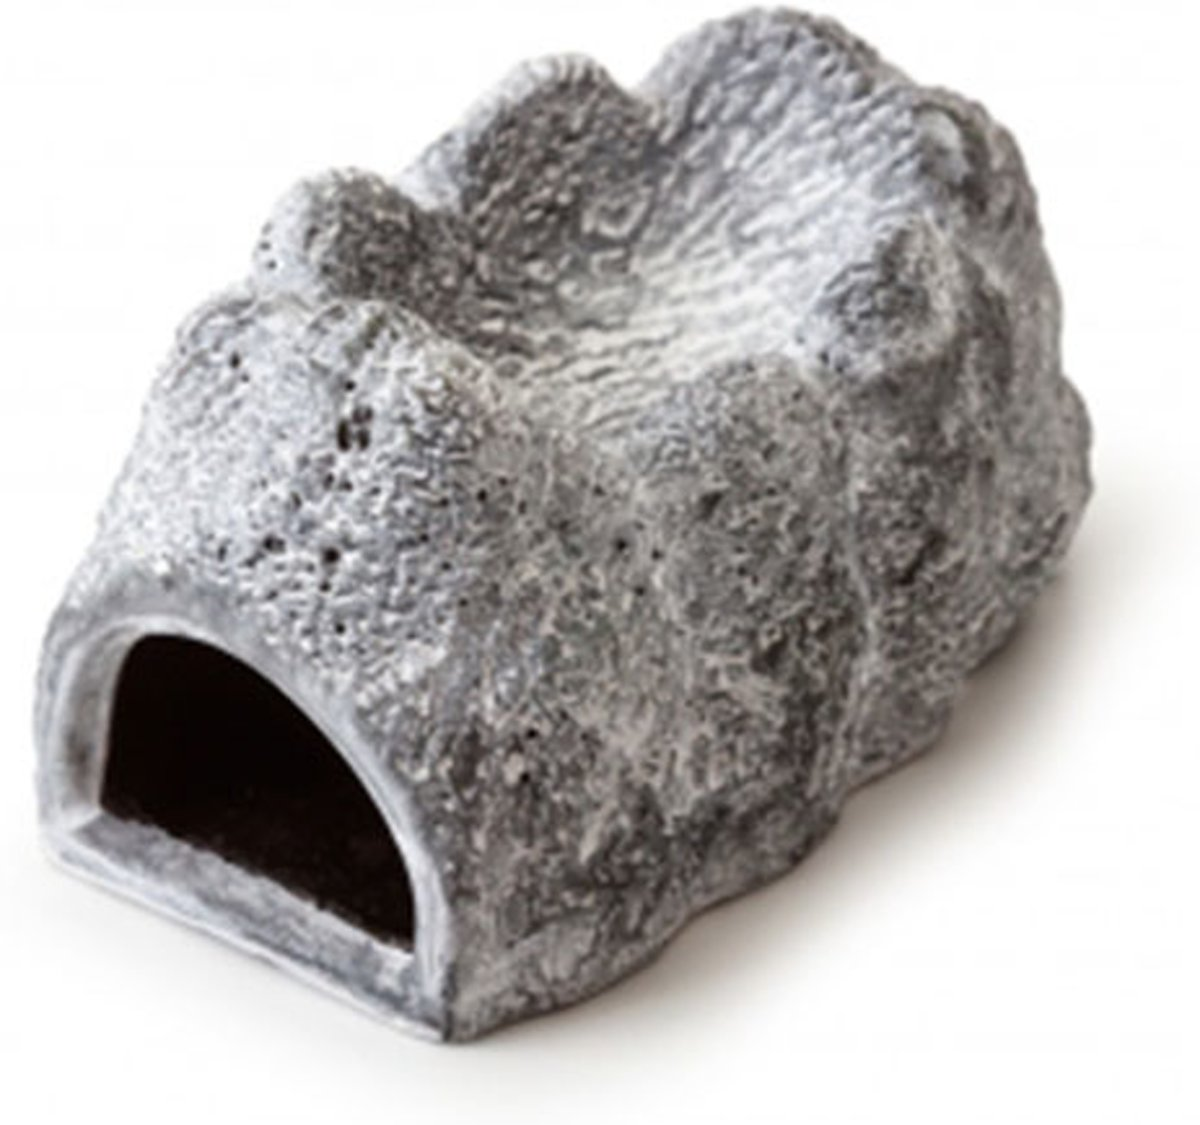 Exo Terra - WET ROCK - small